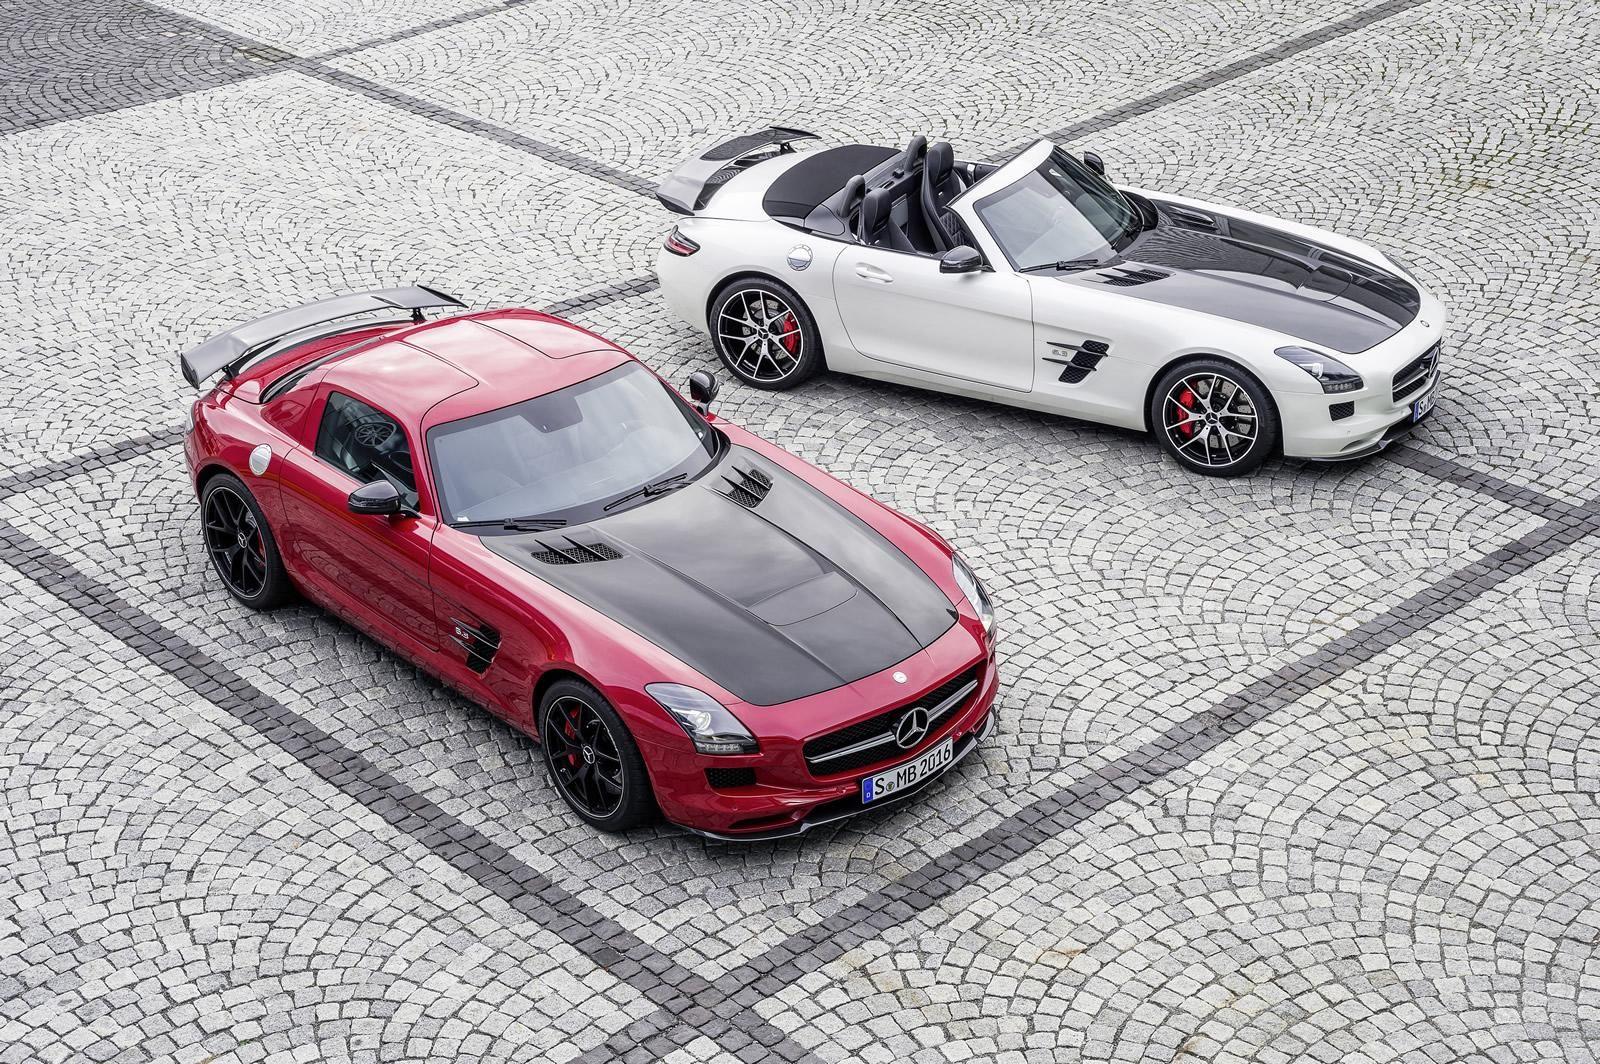 Mercedes Benz Sls Amg Gt Final Edition 12 Mersedes Bens